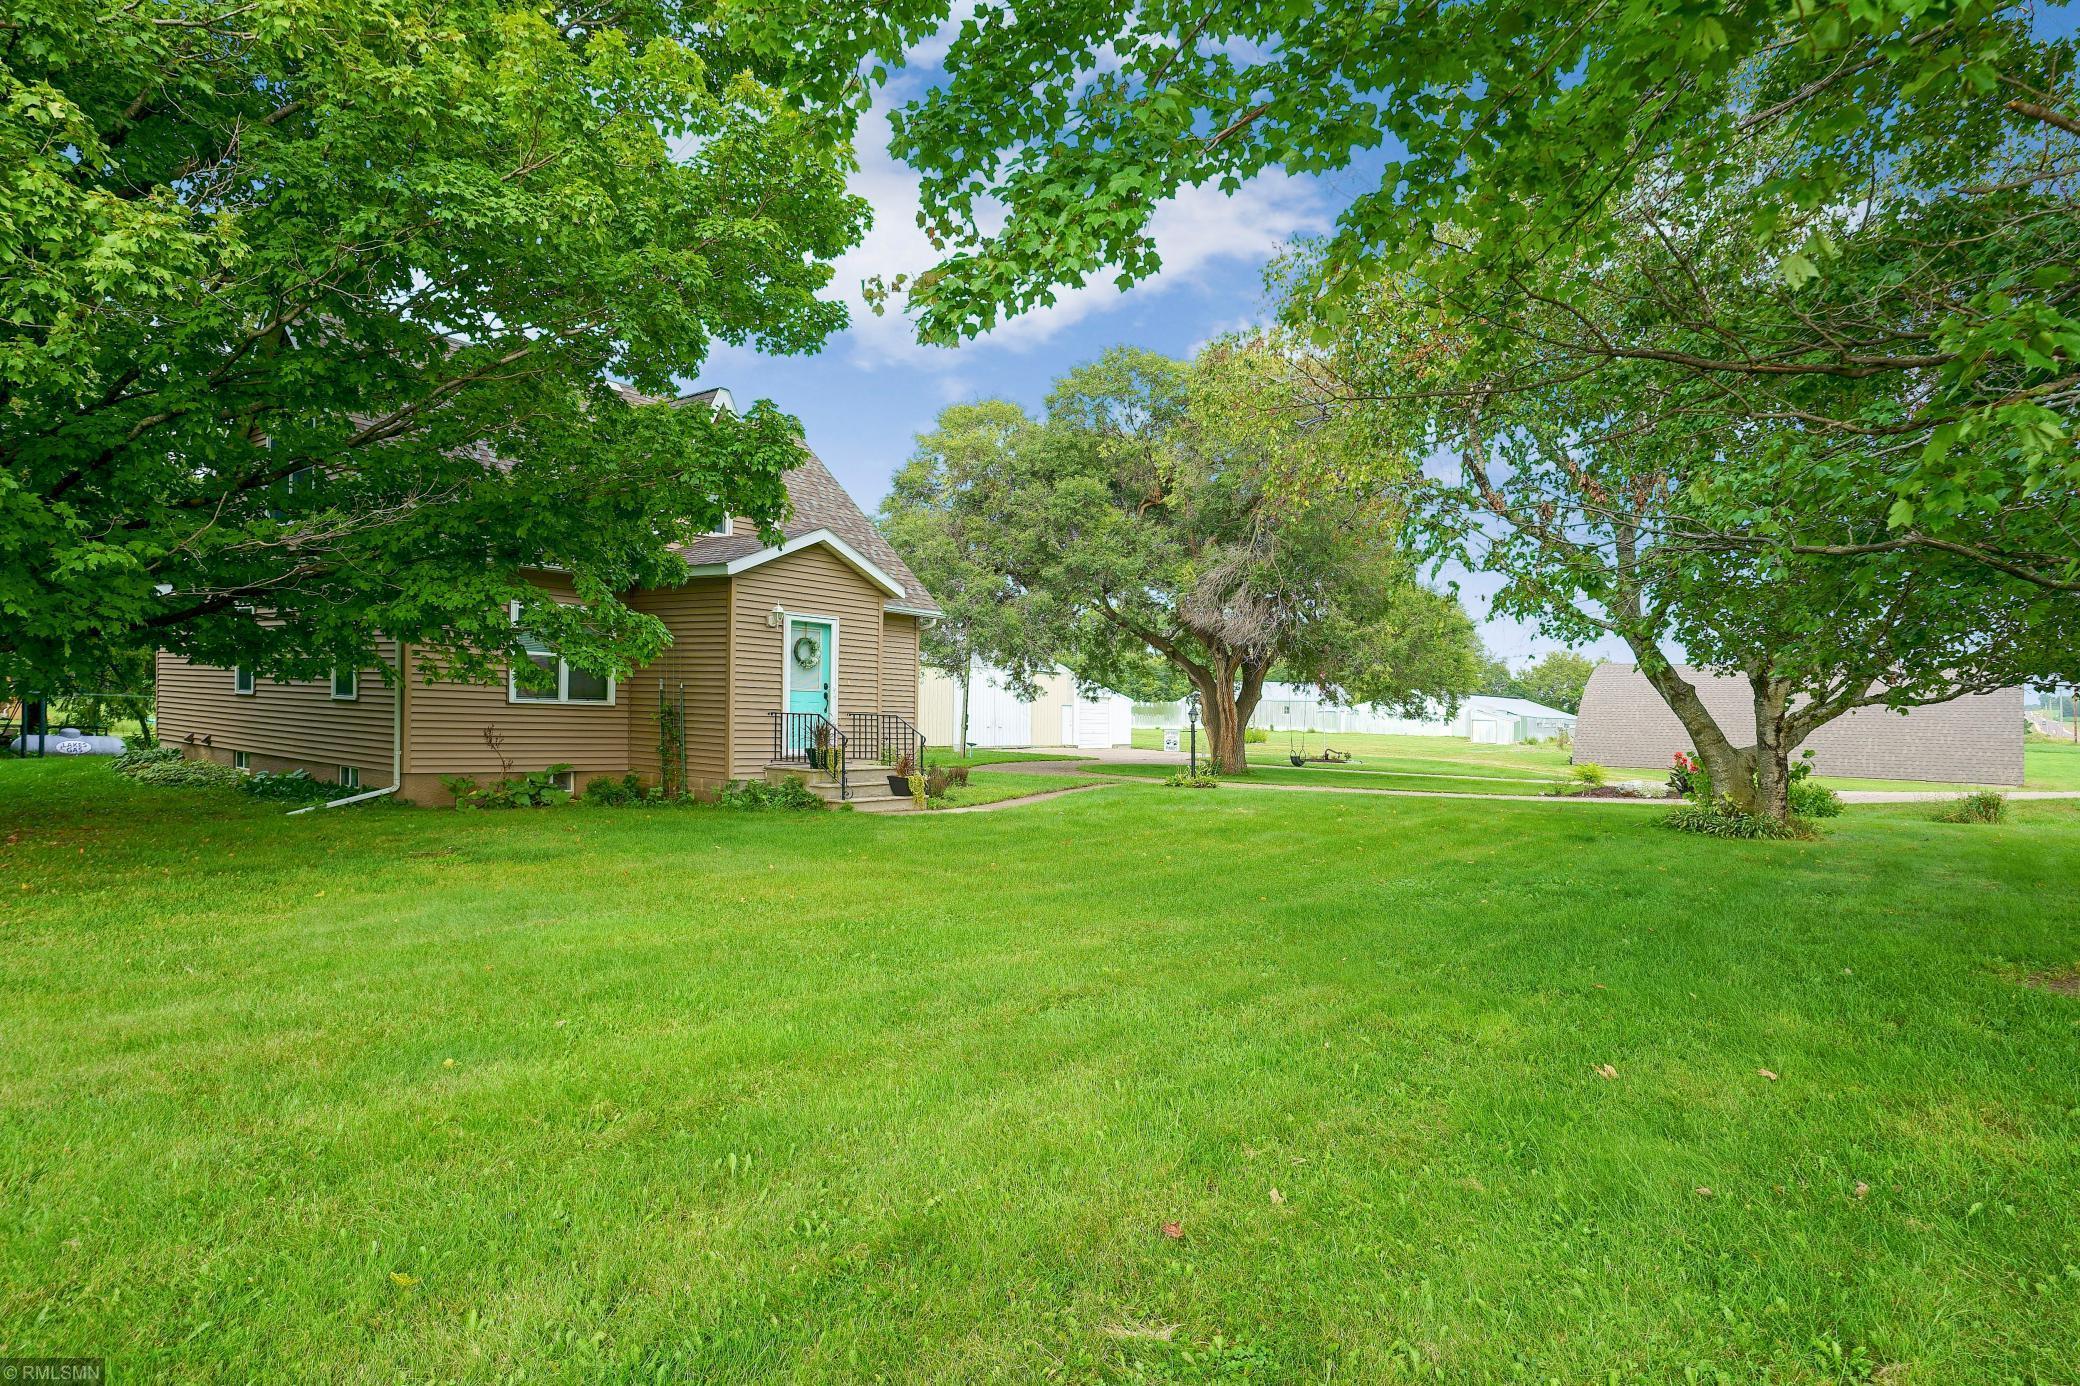 2134 County Road N Property Photo - Baldwin, WI real estate listing